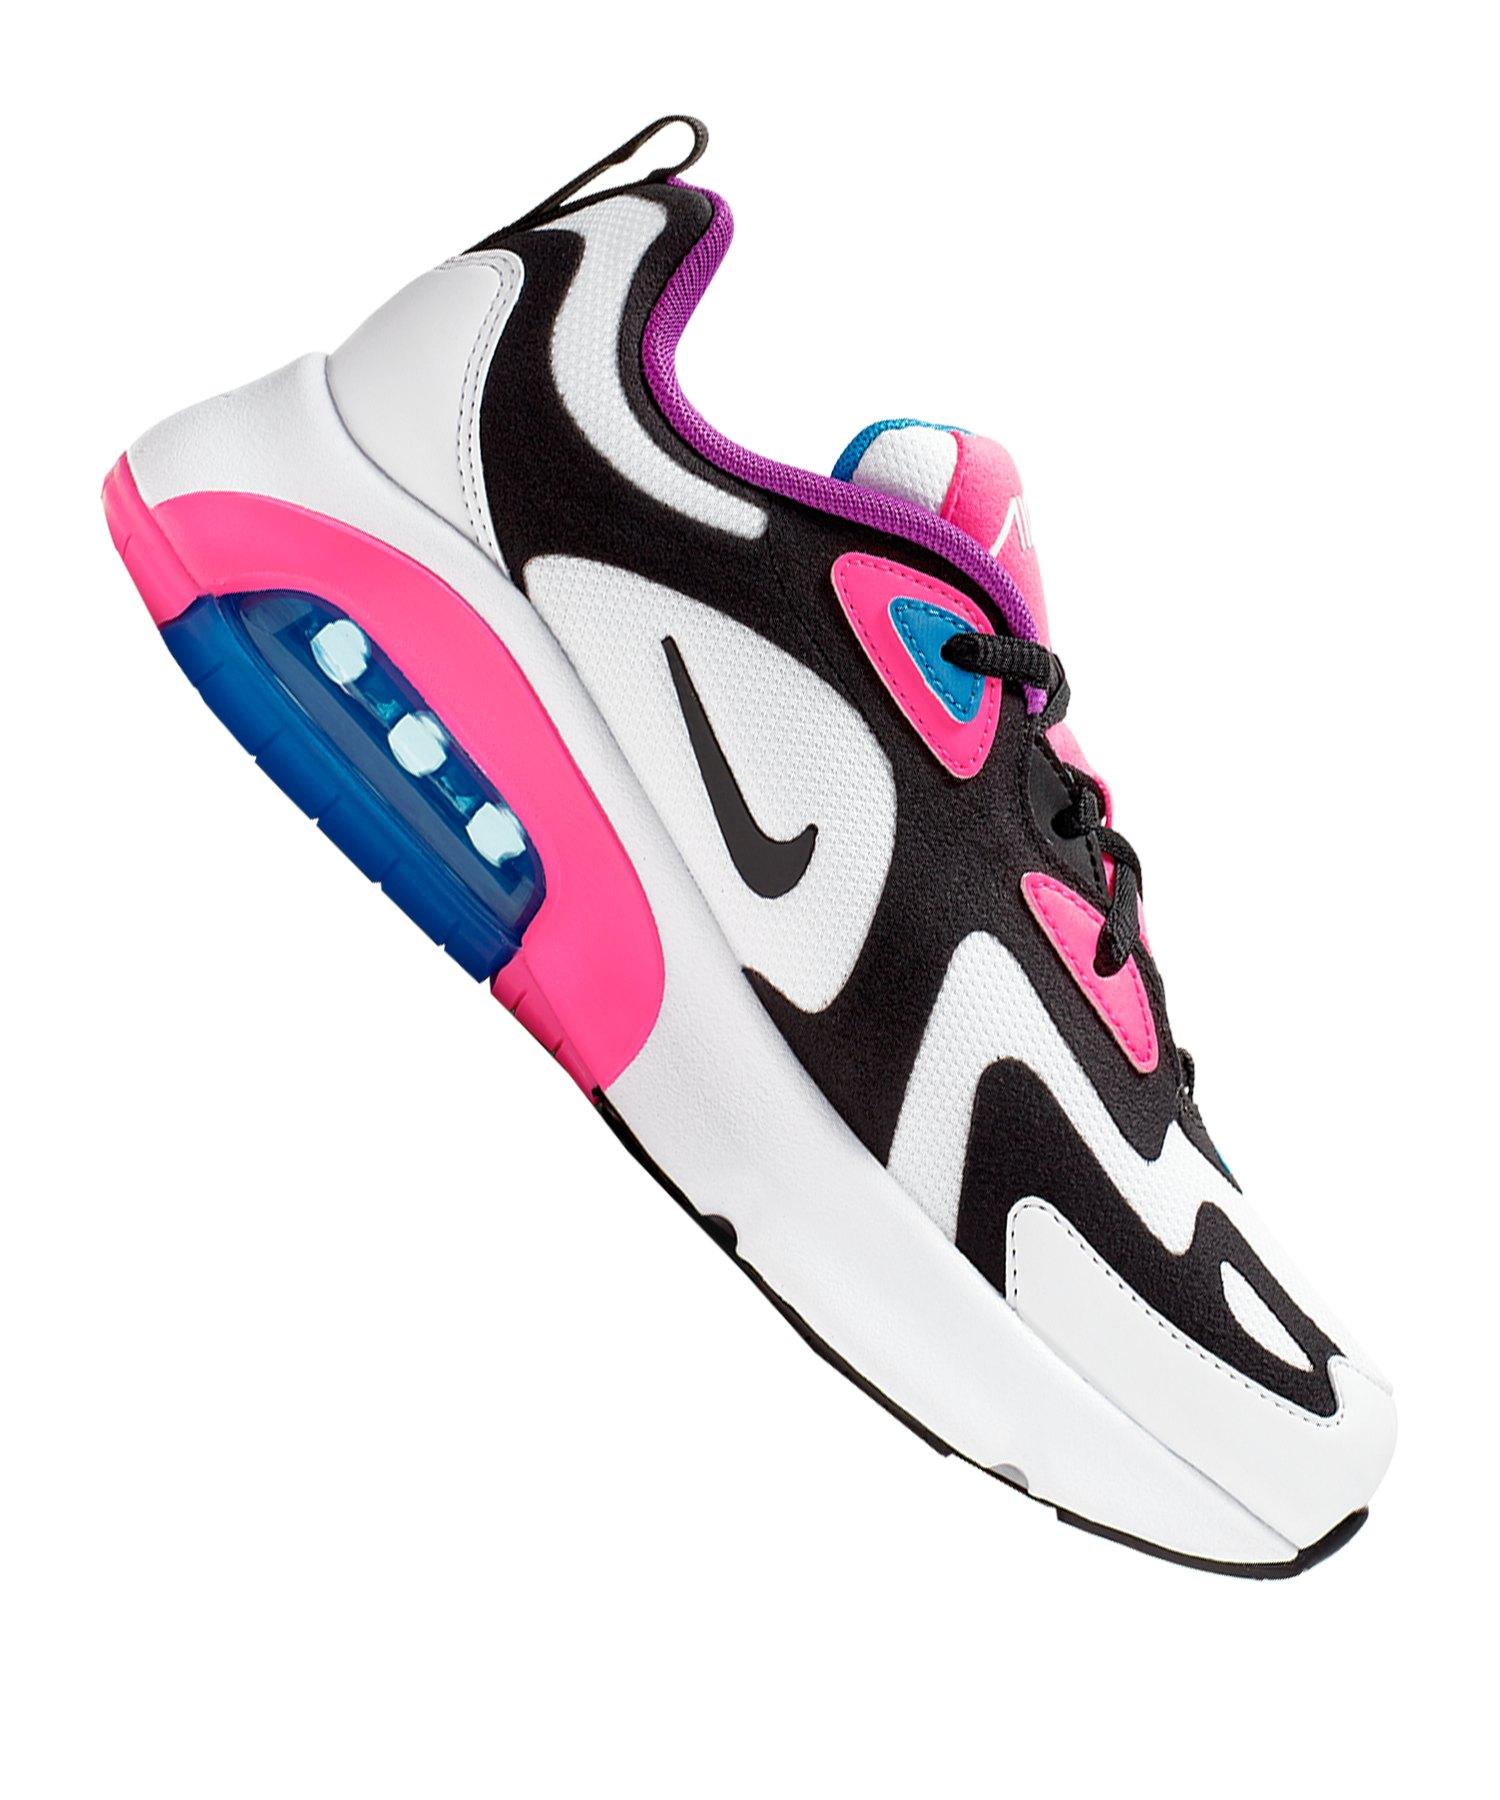 air max weiß pink blau nike YfybI76vgm